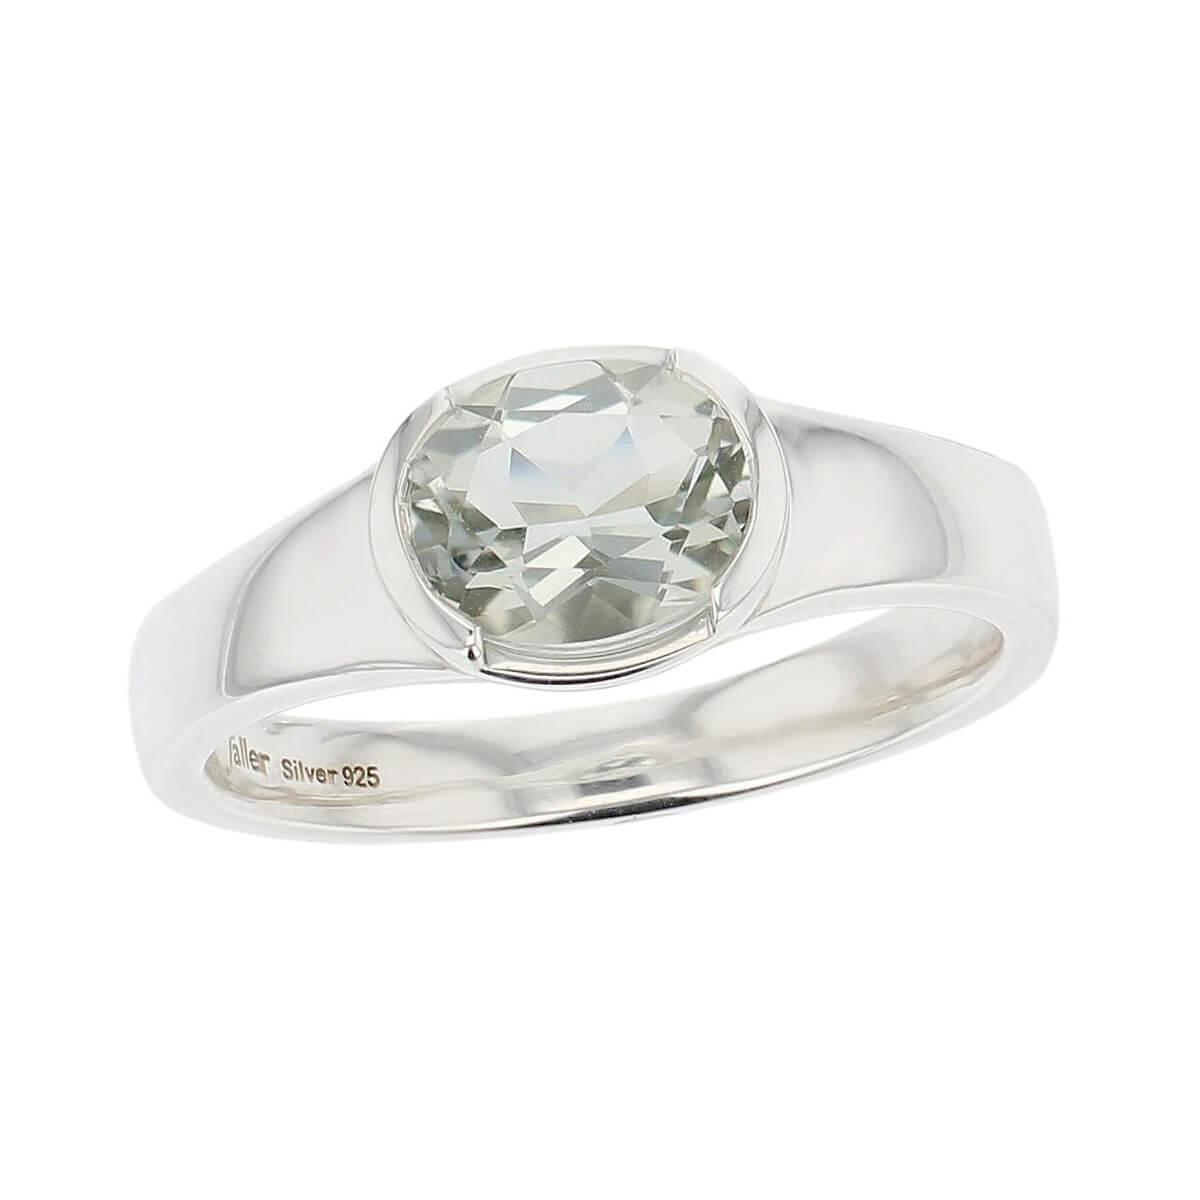 sterling silver oval cut faceted prasiolite gemstone dress ring, designer jewellery, green quartz gem, jewelry, handmade by Faller, Londonderry, Northern Ireland, Irish hand crafted, darcy, D'arcy